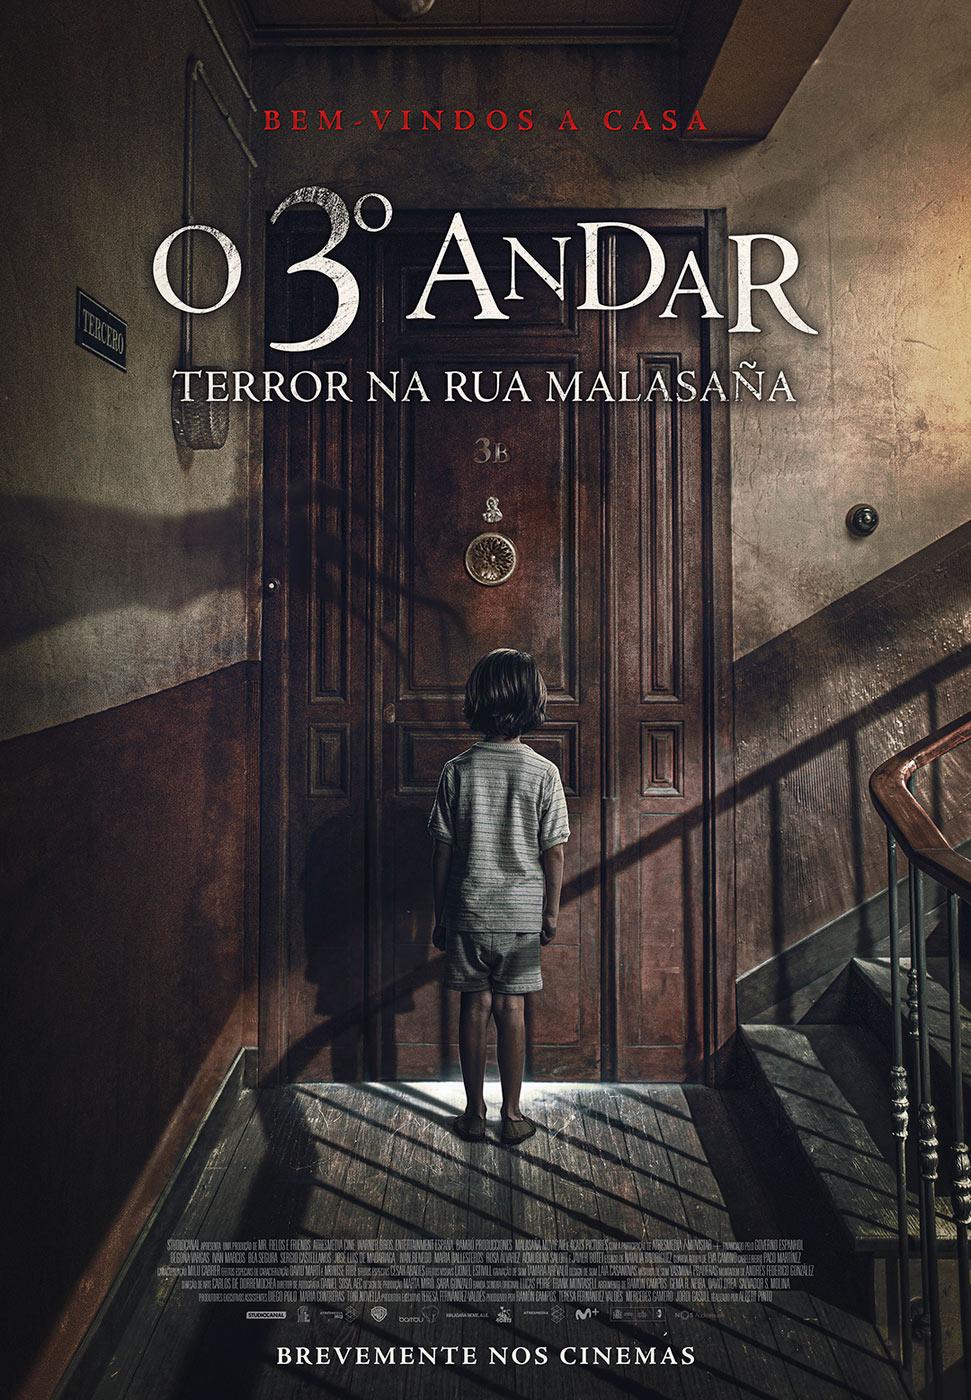 O 3º ANDAR - TERROR NA RUA MALASAÑA